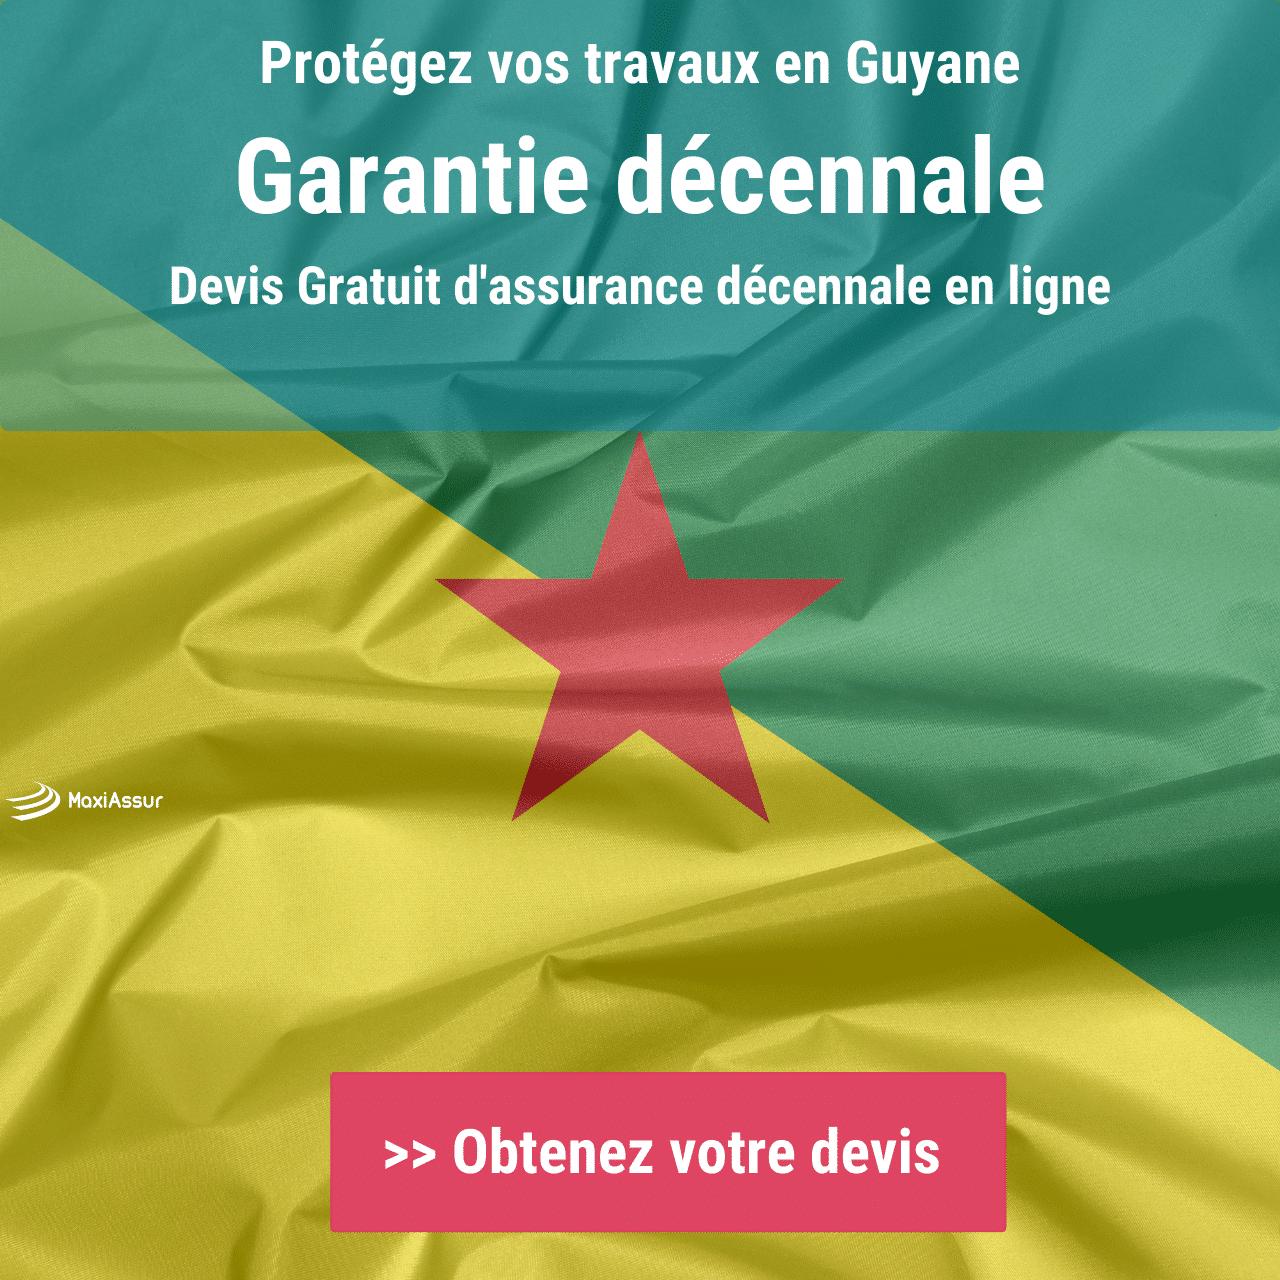 garantie décennale Guyane